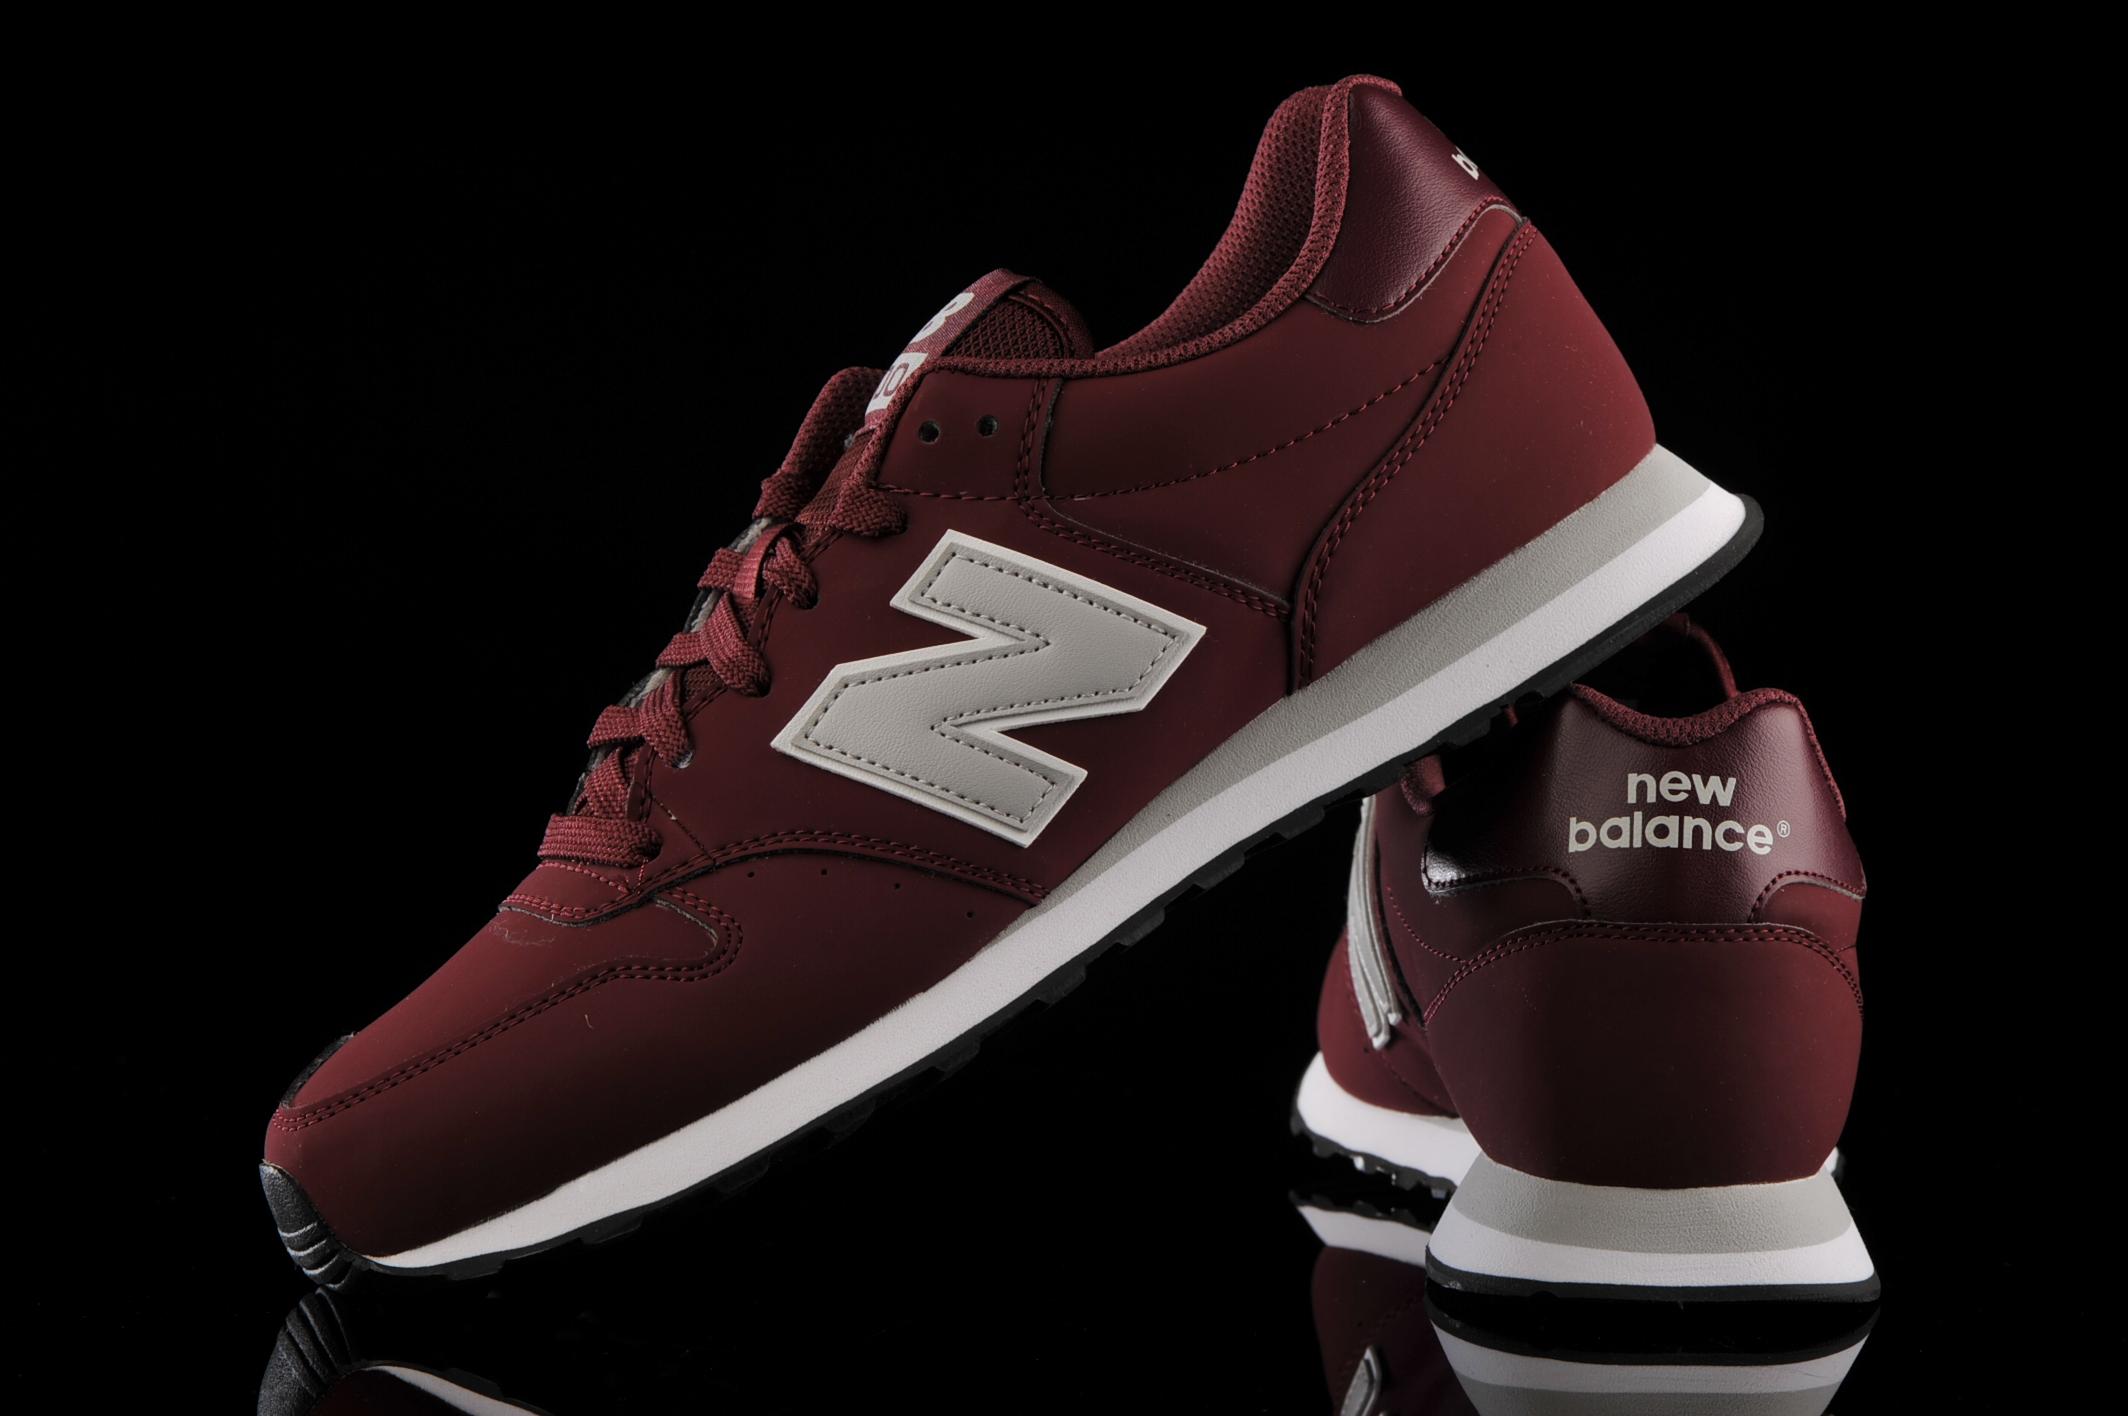 New Balance | R-GOL.com - Football boots & equipment